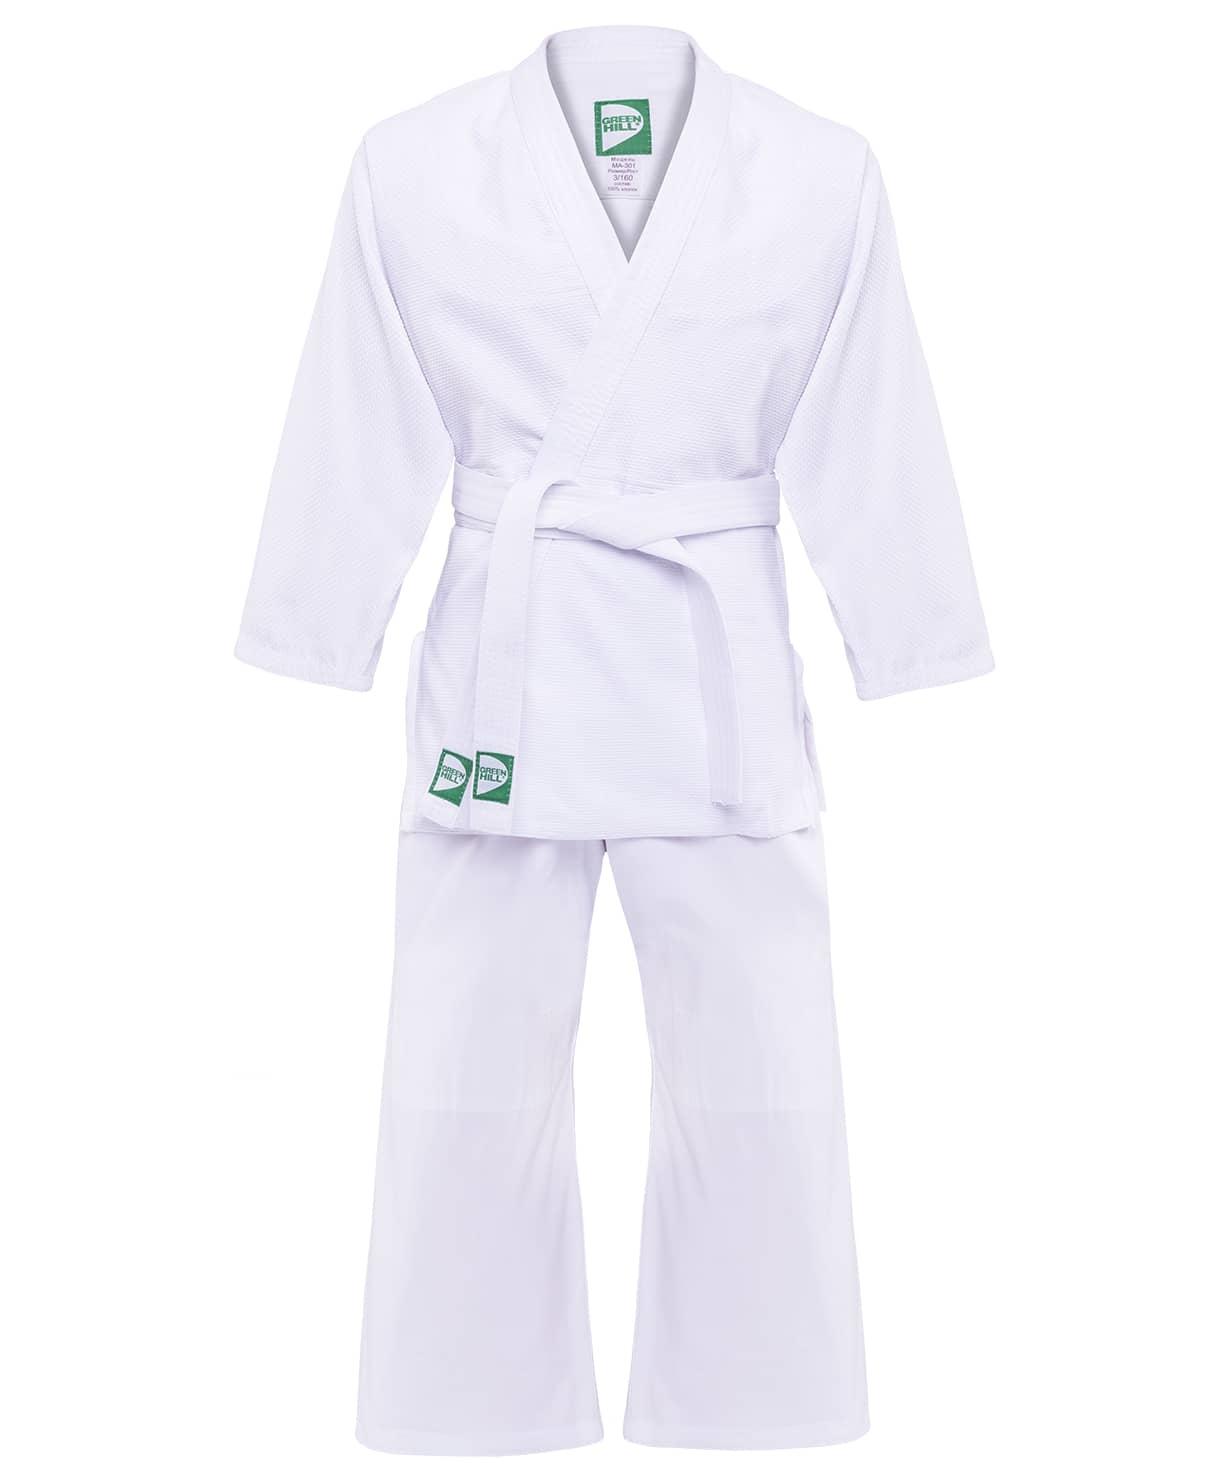 Кимоно для дзюдо MA-301 белый, р.000/110